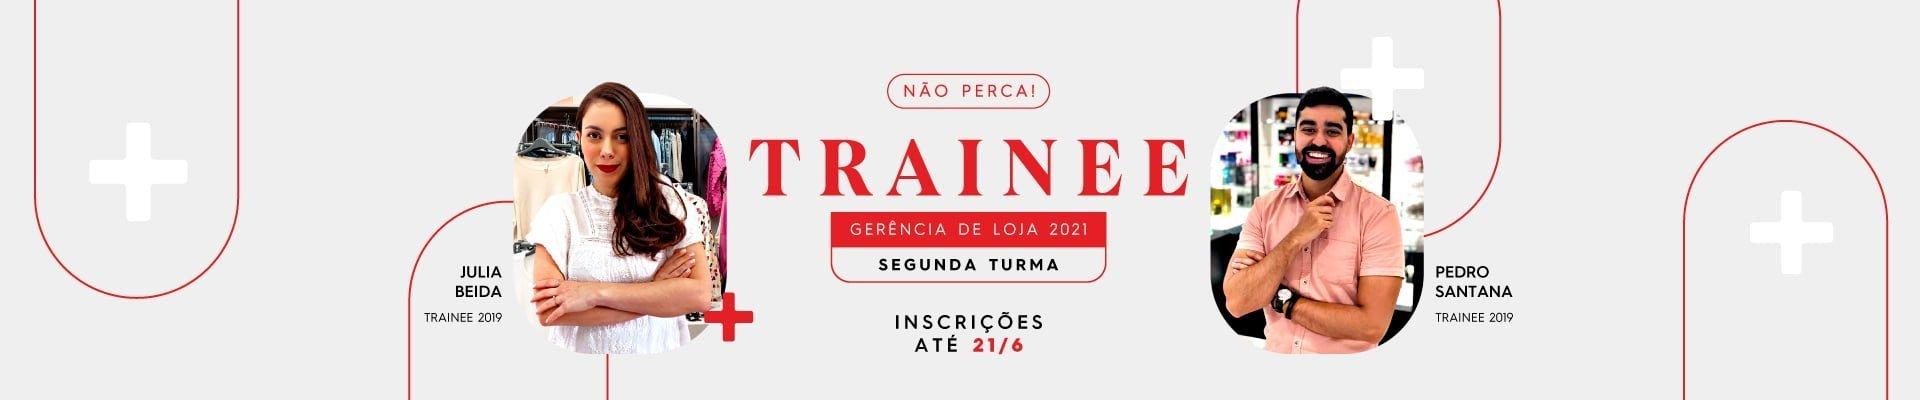 Trainee Renner Gerência de Loja.